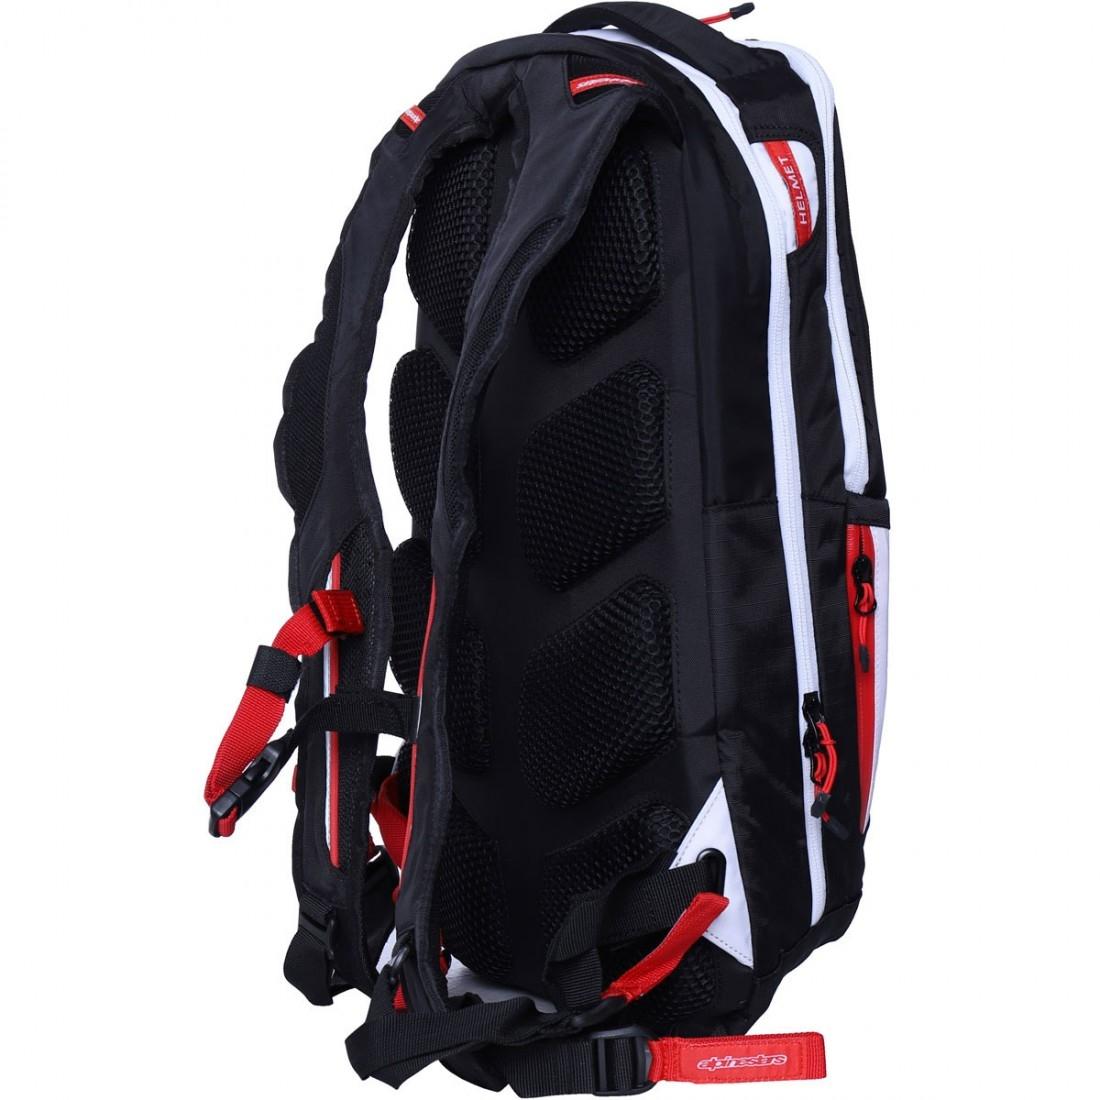 cced62be373bf Tasche ALPINESTARS City Hunter Black   White   Red · Motocard